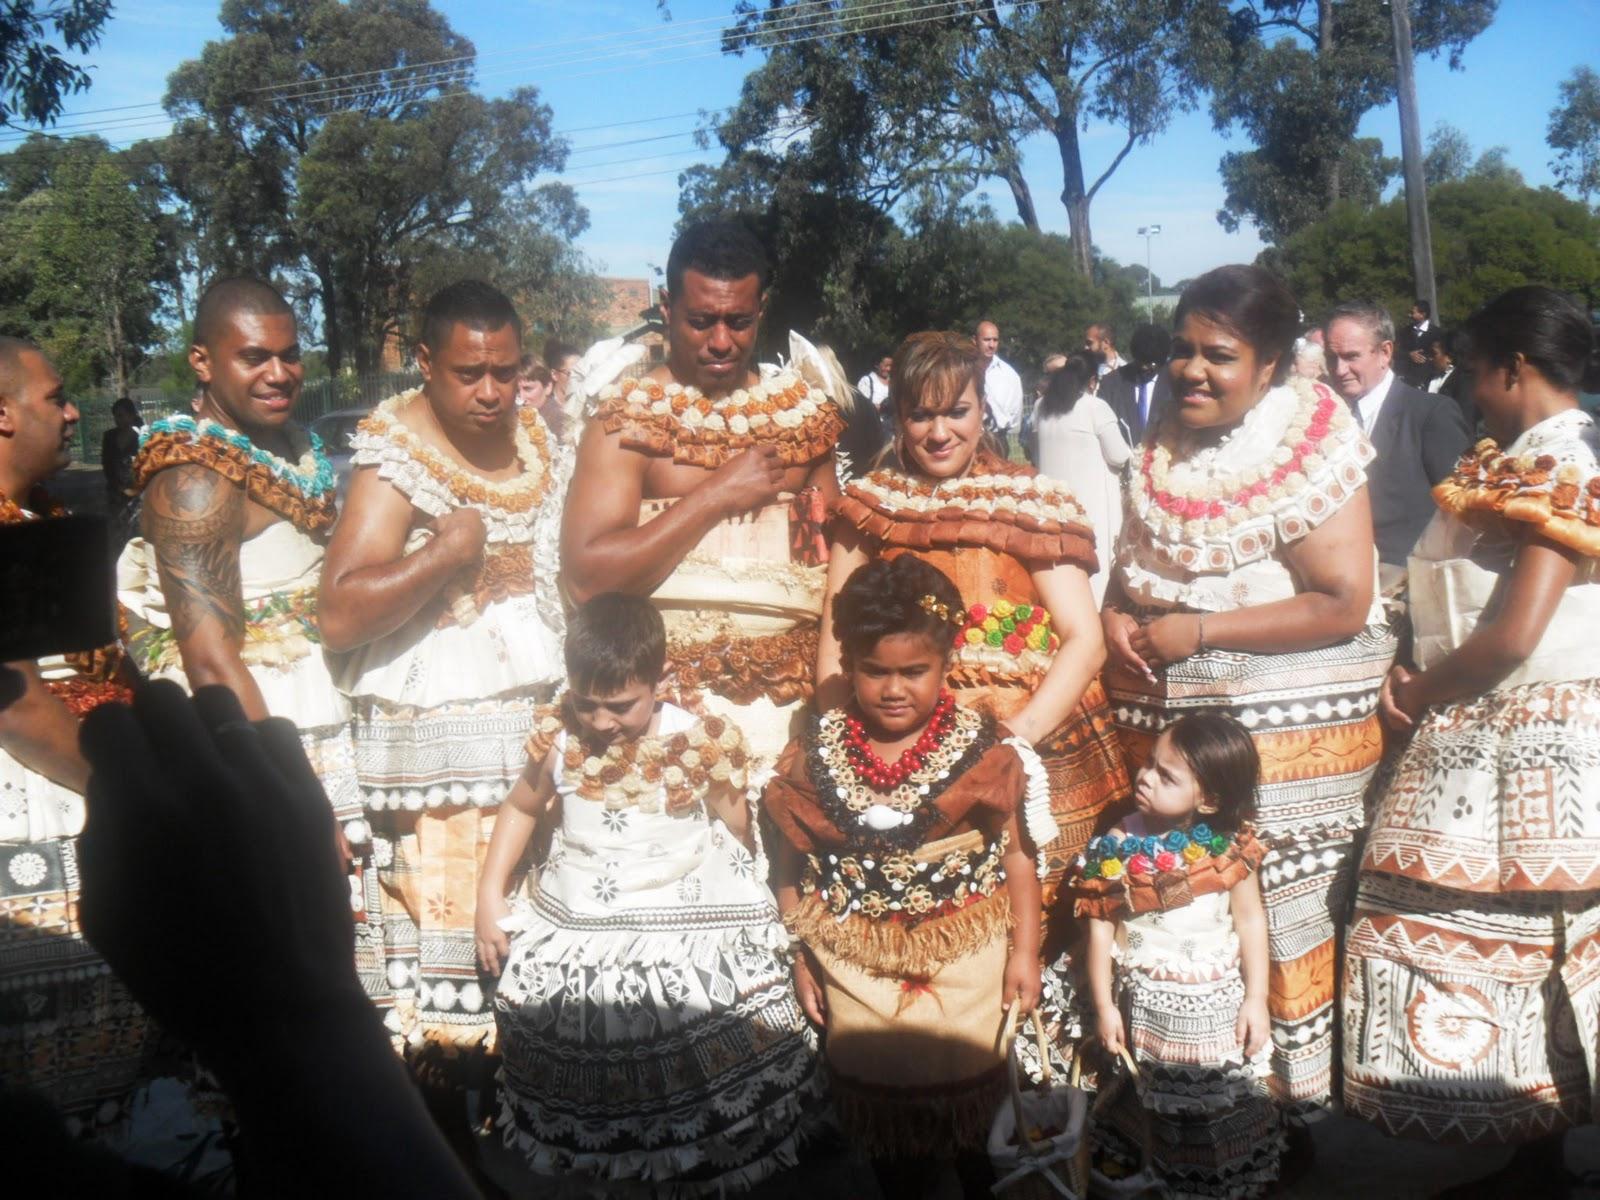 Fiji: Traditional wedding ceremonies